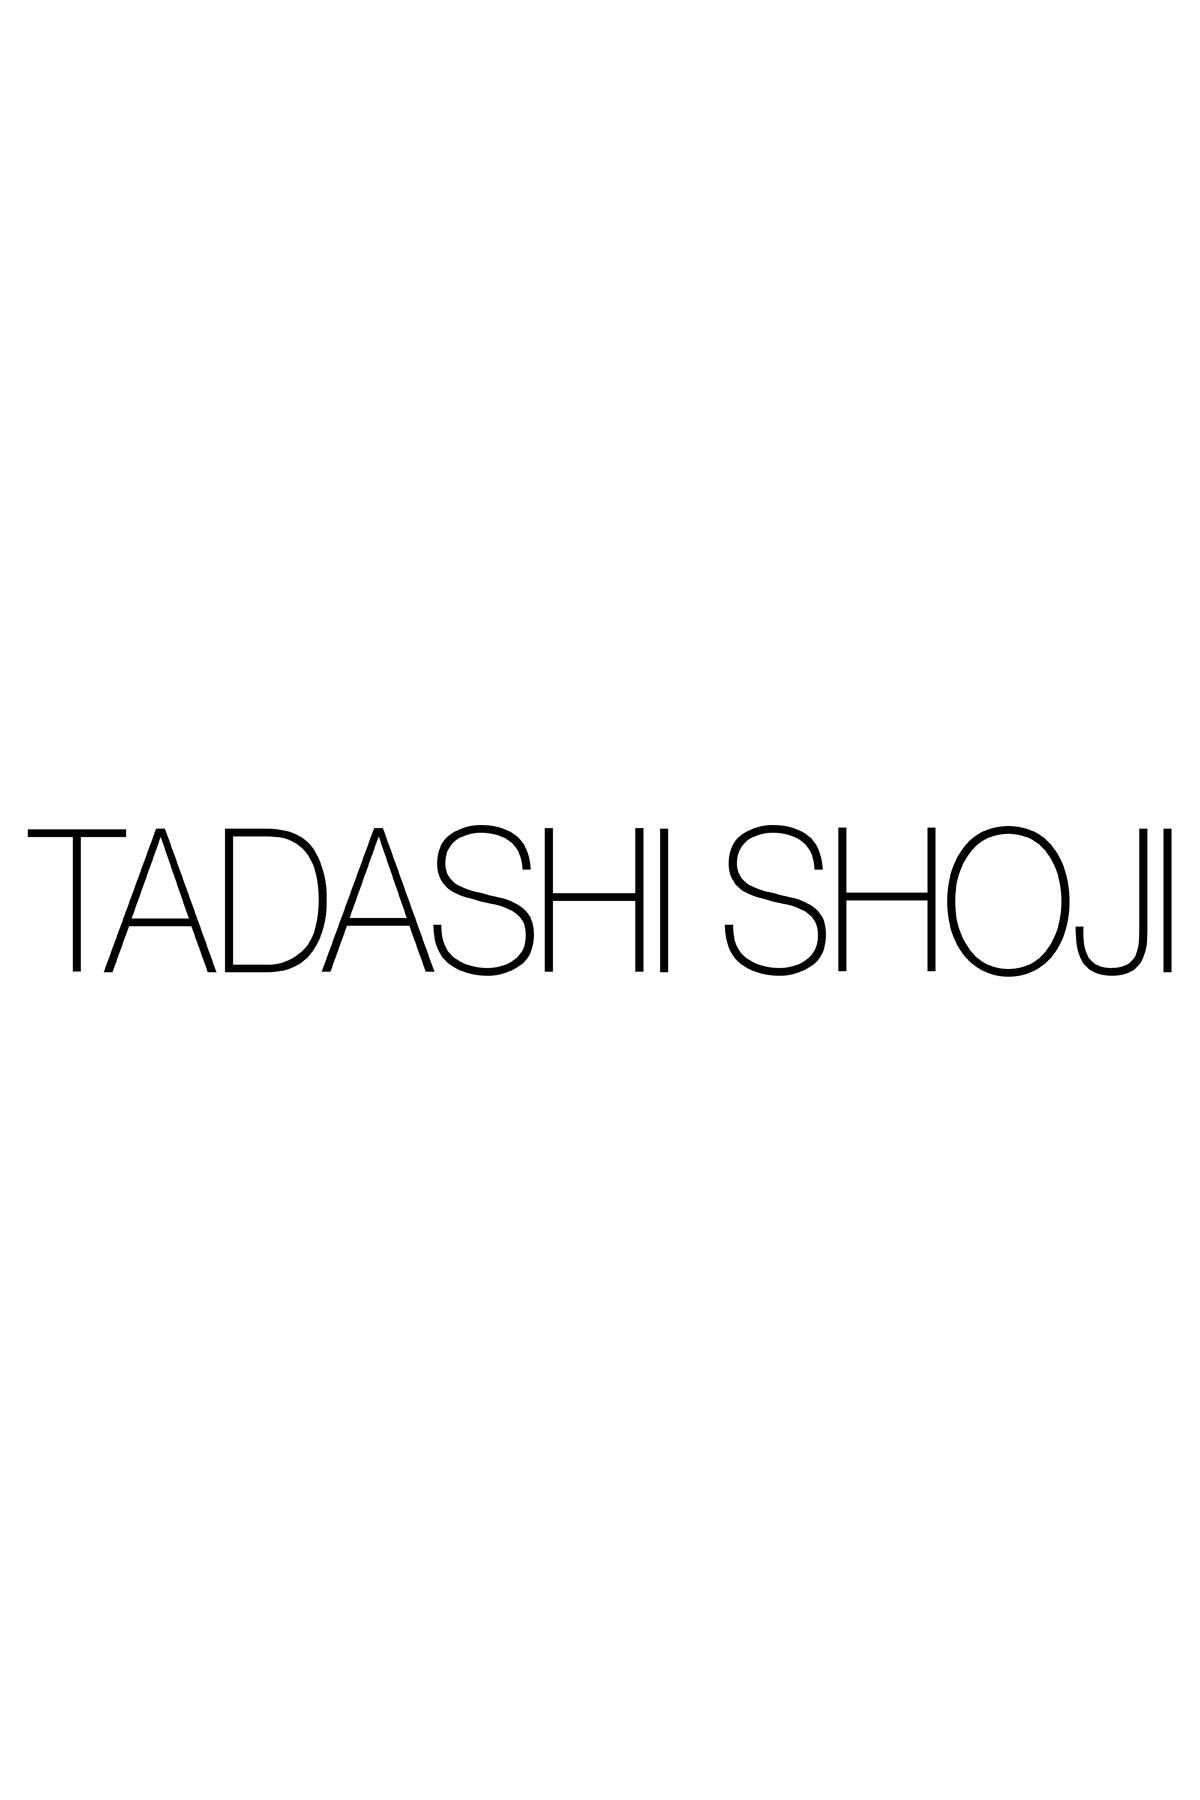 Tadashi Shoji - Yatomi Dress - Detail